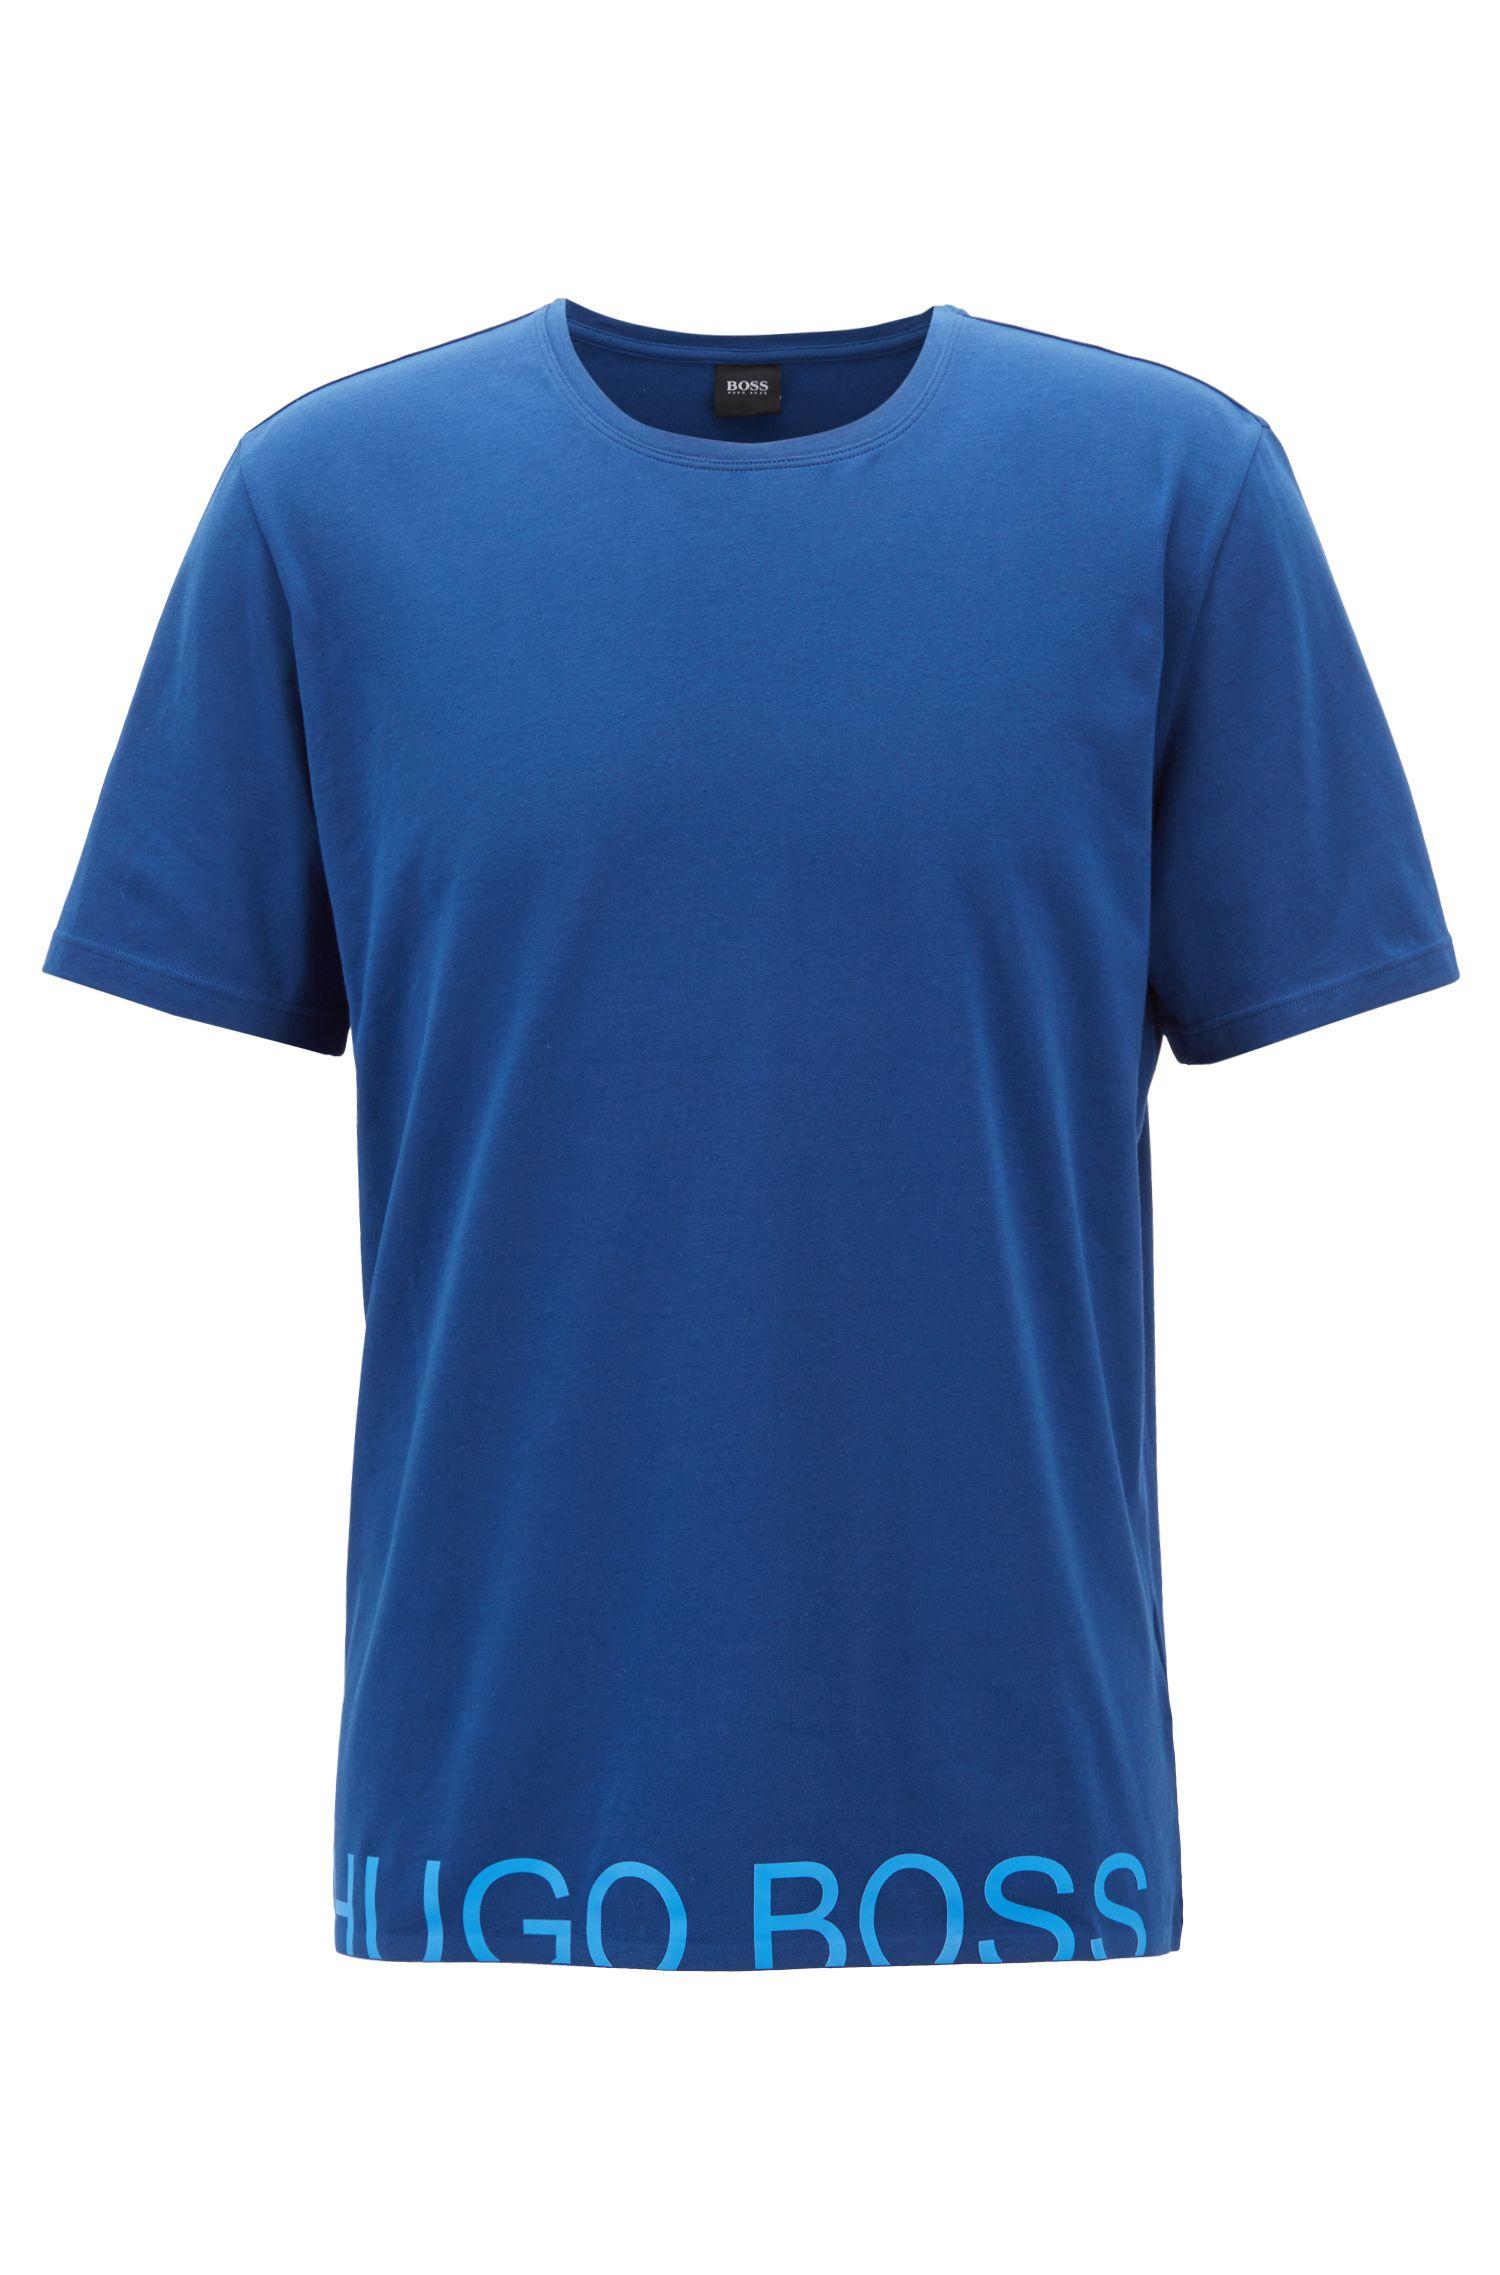 Pyjama-Shirt aus Single Jersey mit abgeschnittenem Logo, Blau